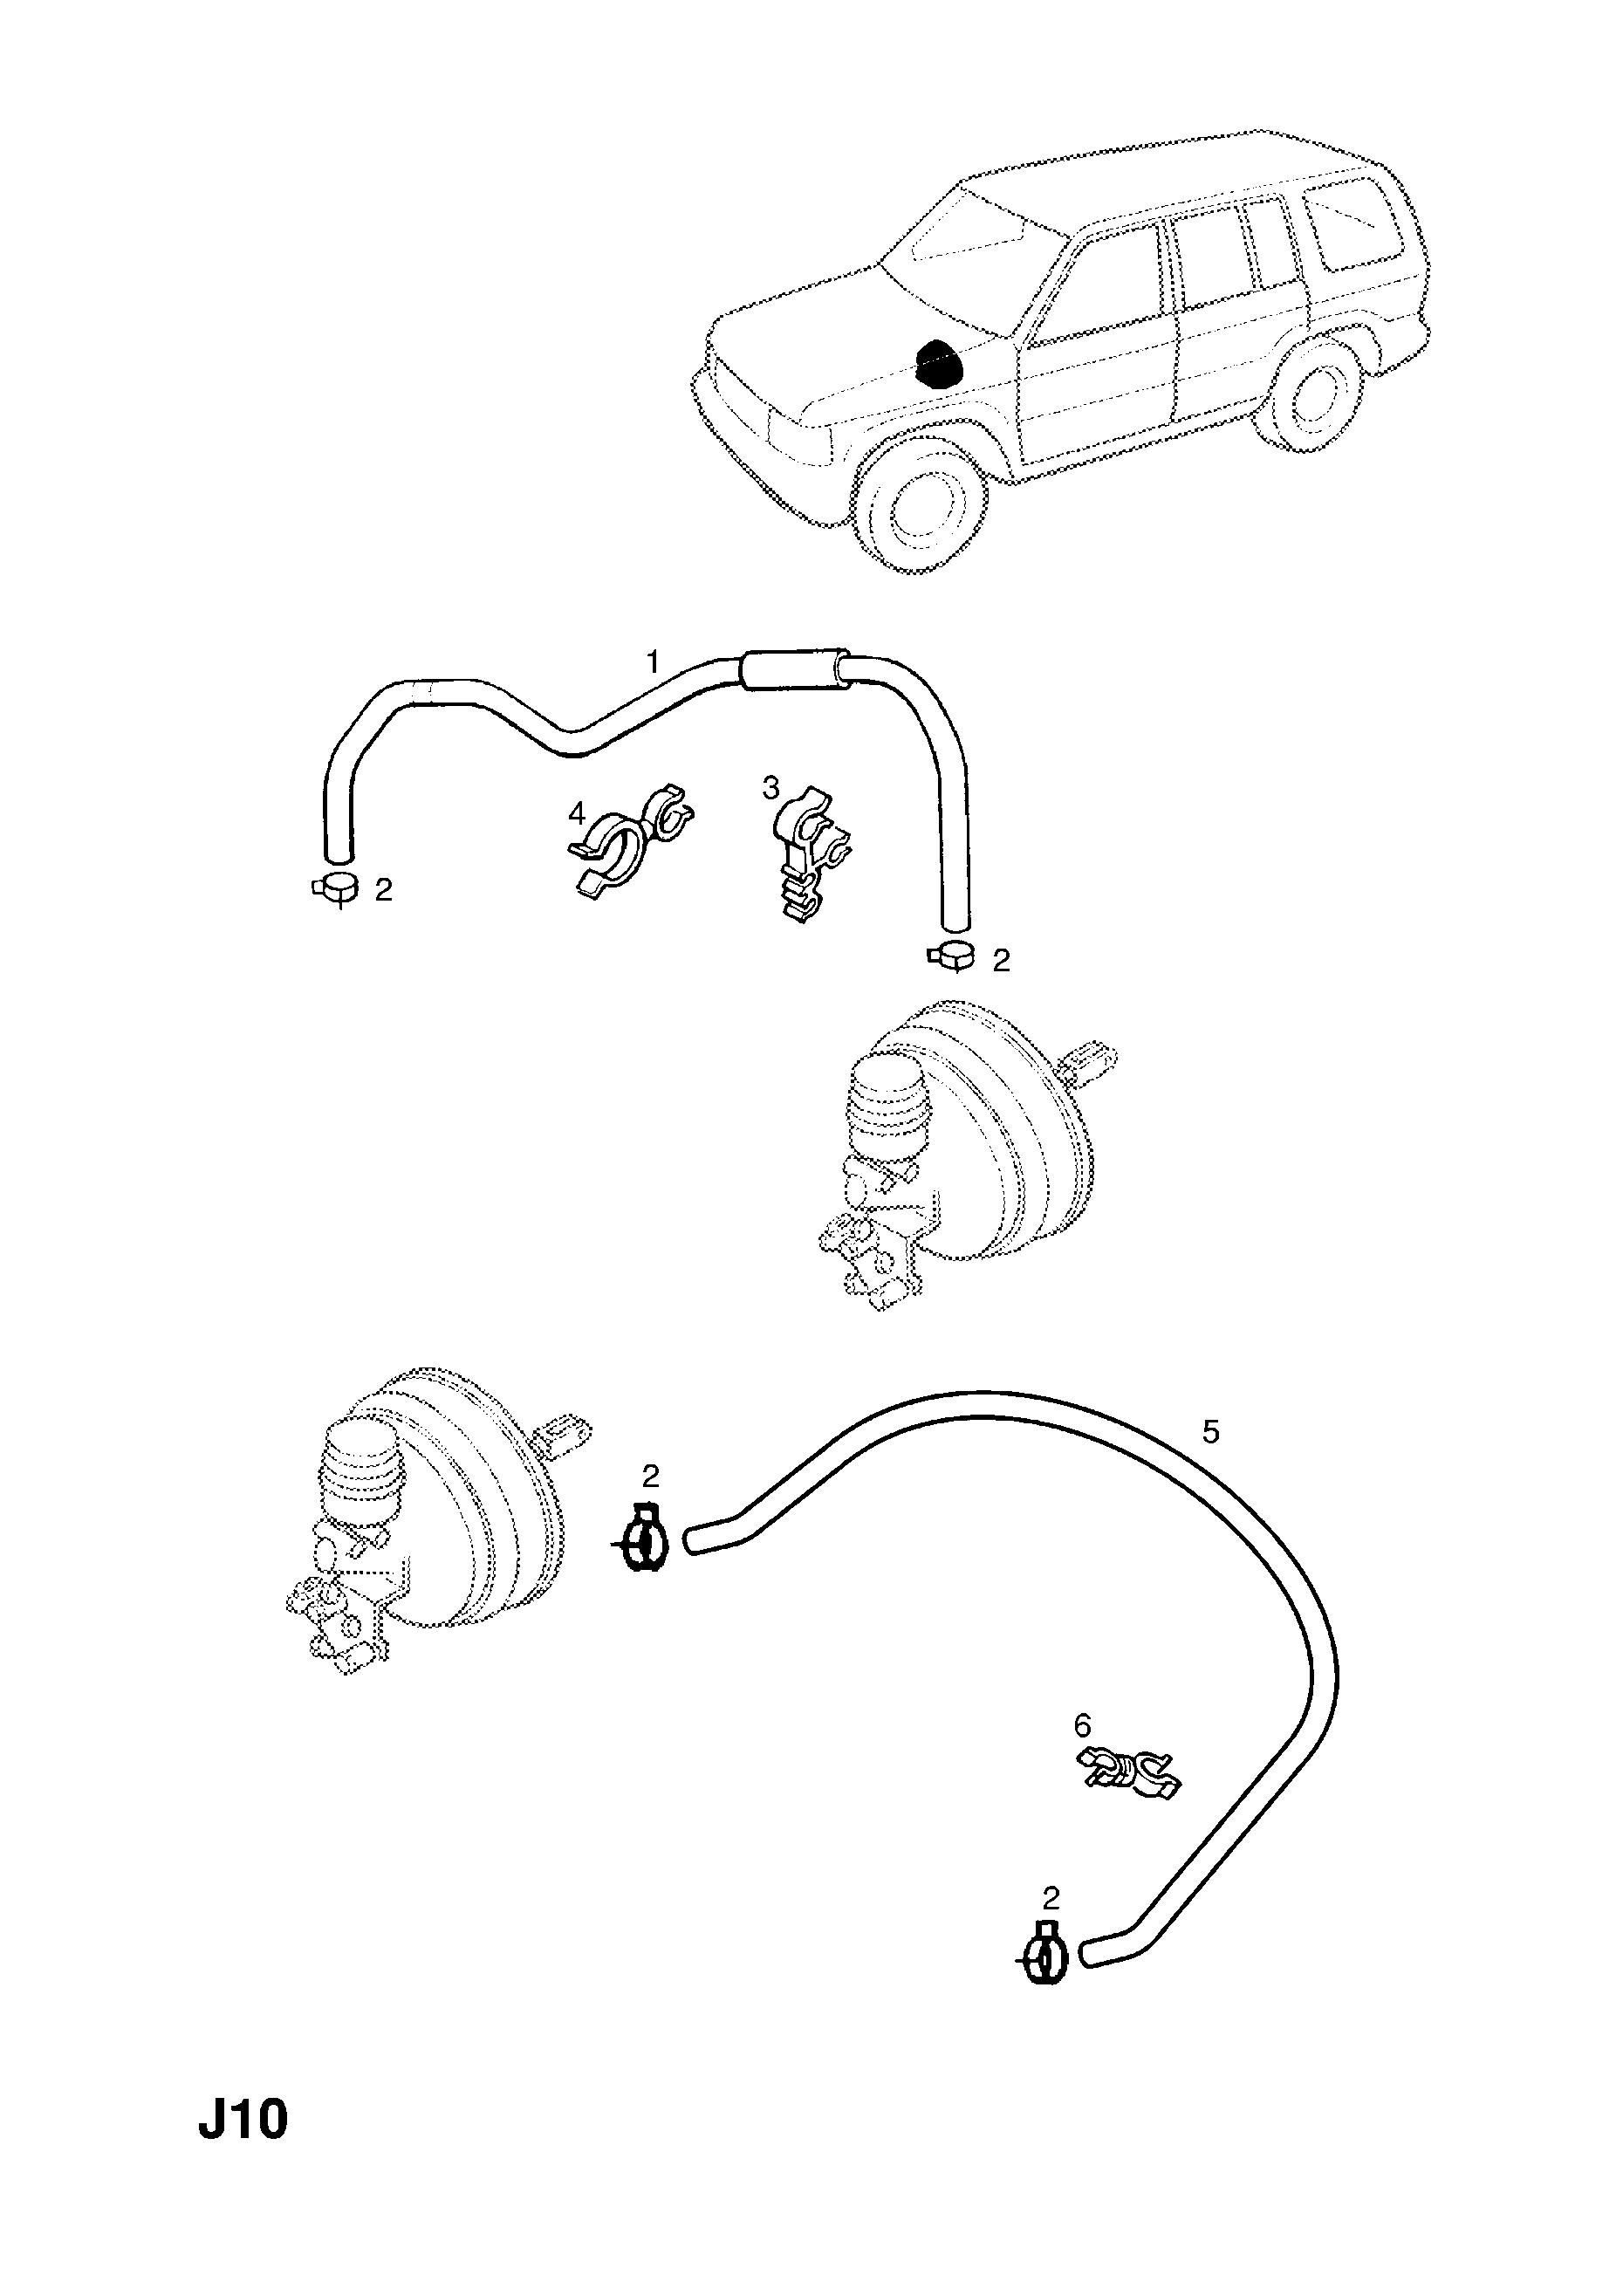 Opel Monterey Vacuum Diagram Electrical Wiring Diagrams 1998 2000 J Brakes 12 For Servo Catcar